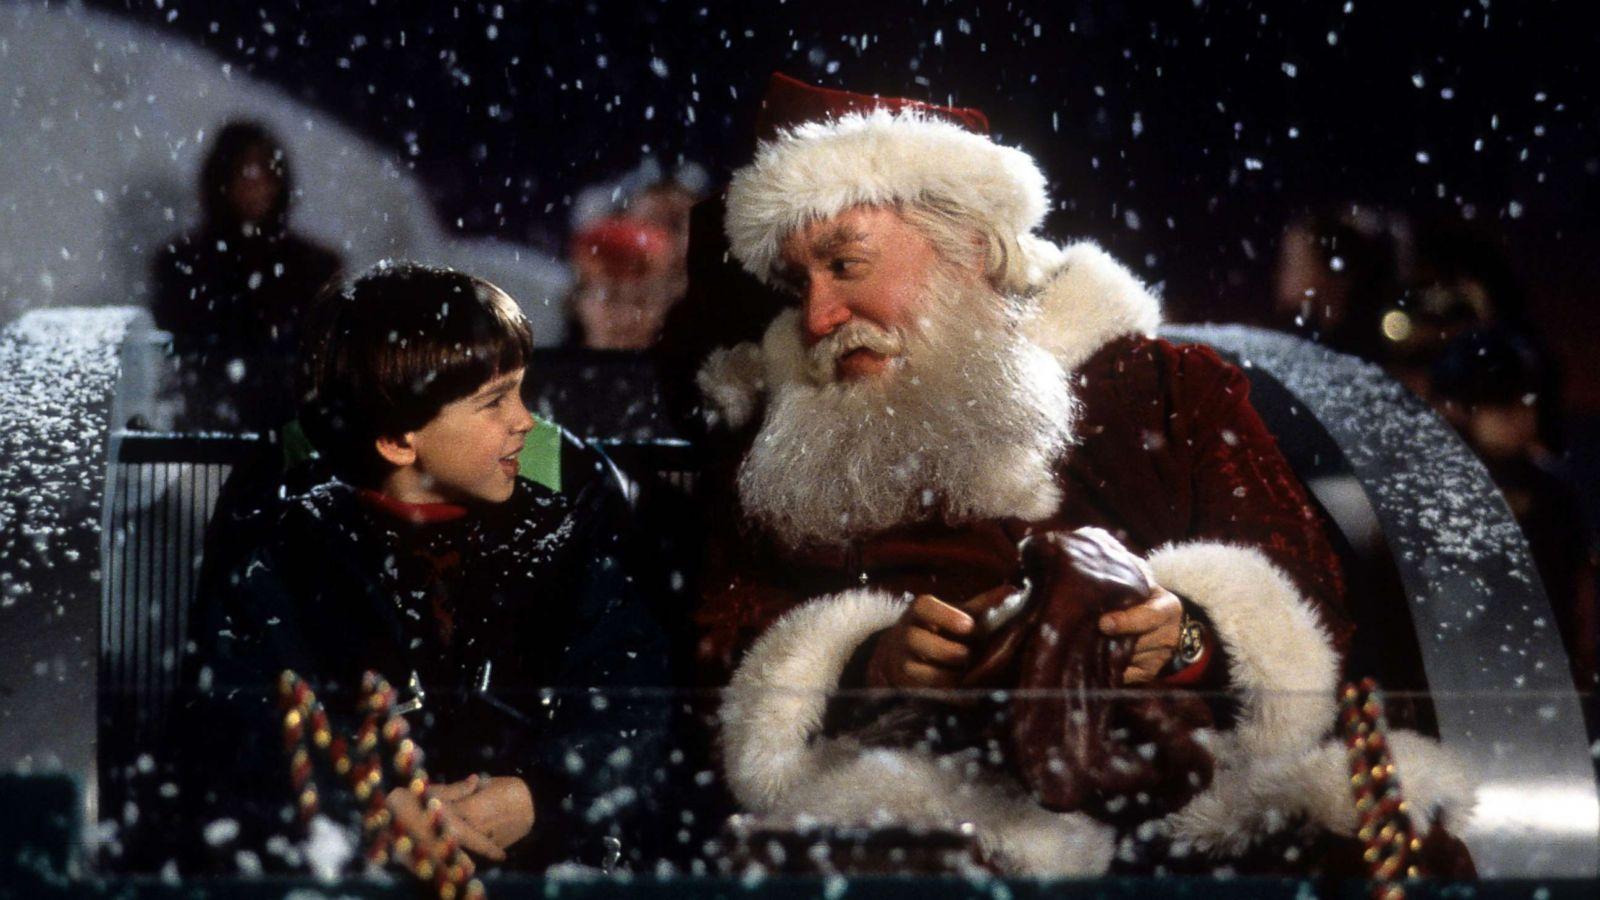 30 holiday movies to stream on netflix this christmas abc news - Best Christmas Movies On Hulu